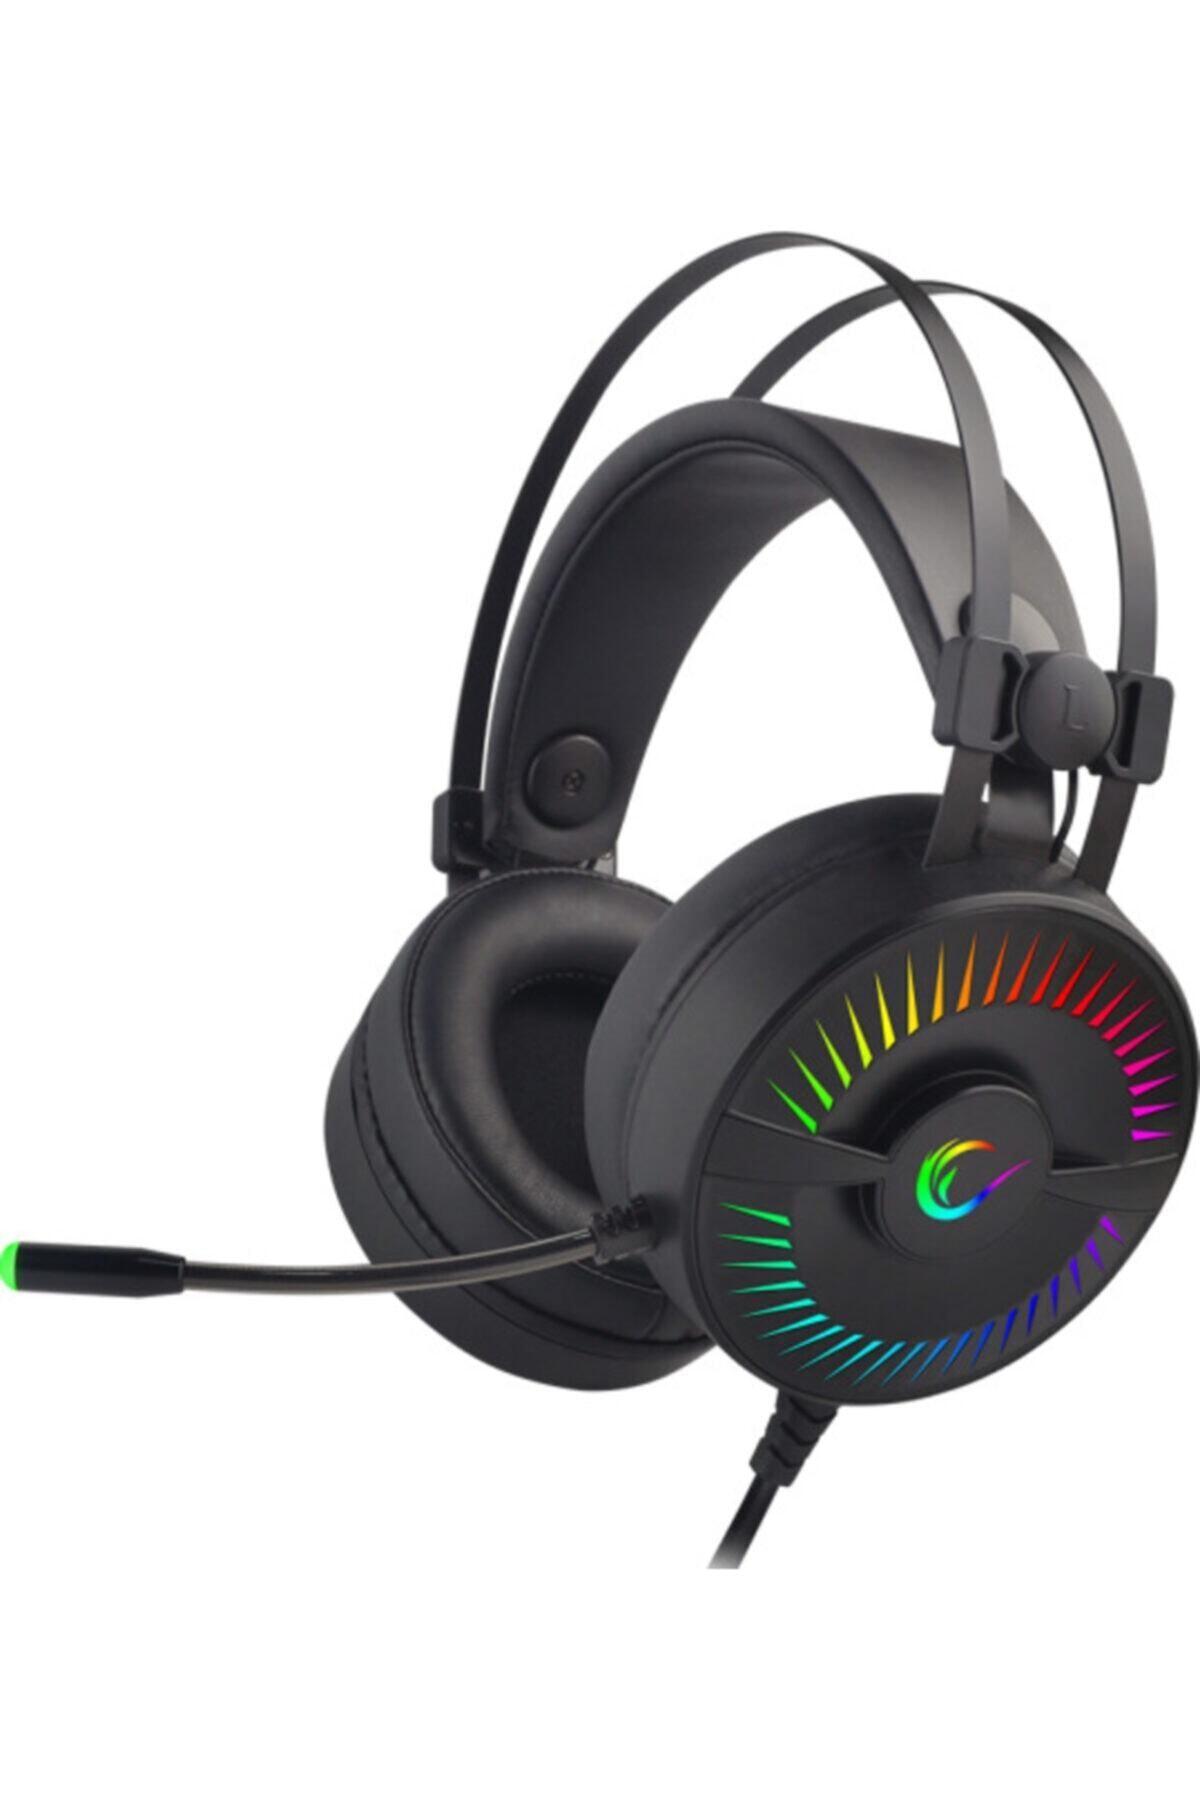 Rm-2019g X-tıtan Rgb 7.1 Surround Usb Mikrofonlu Oyuncu Kulaklığı Profesyonel Kulaklık